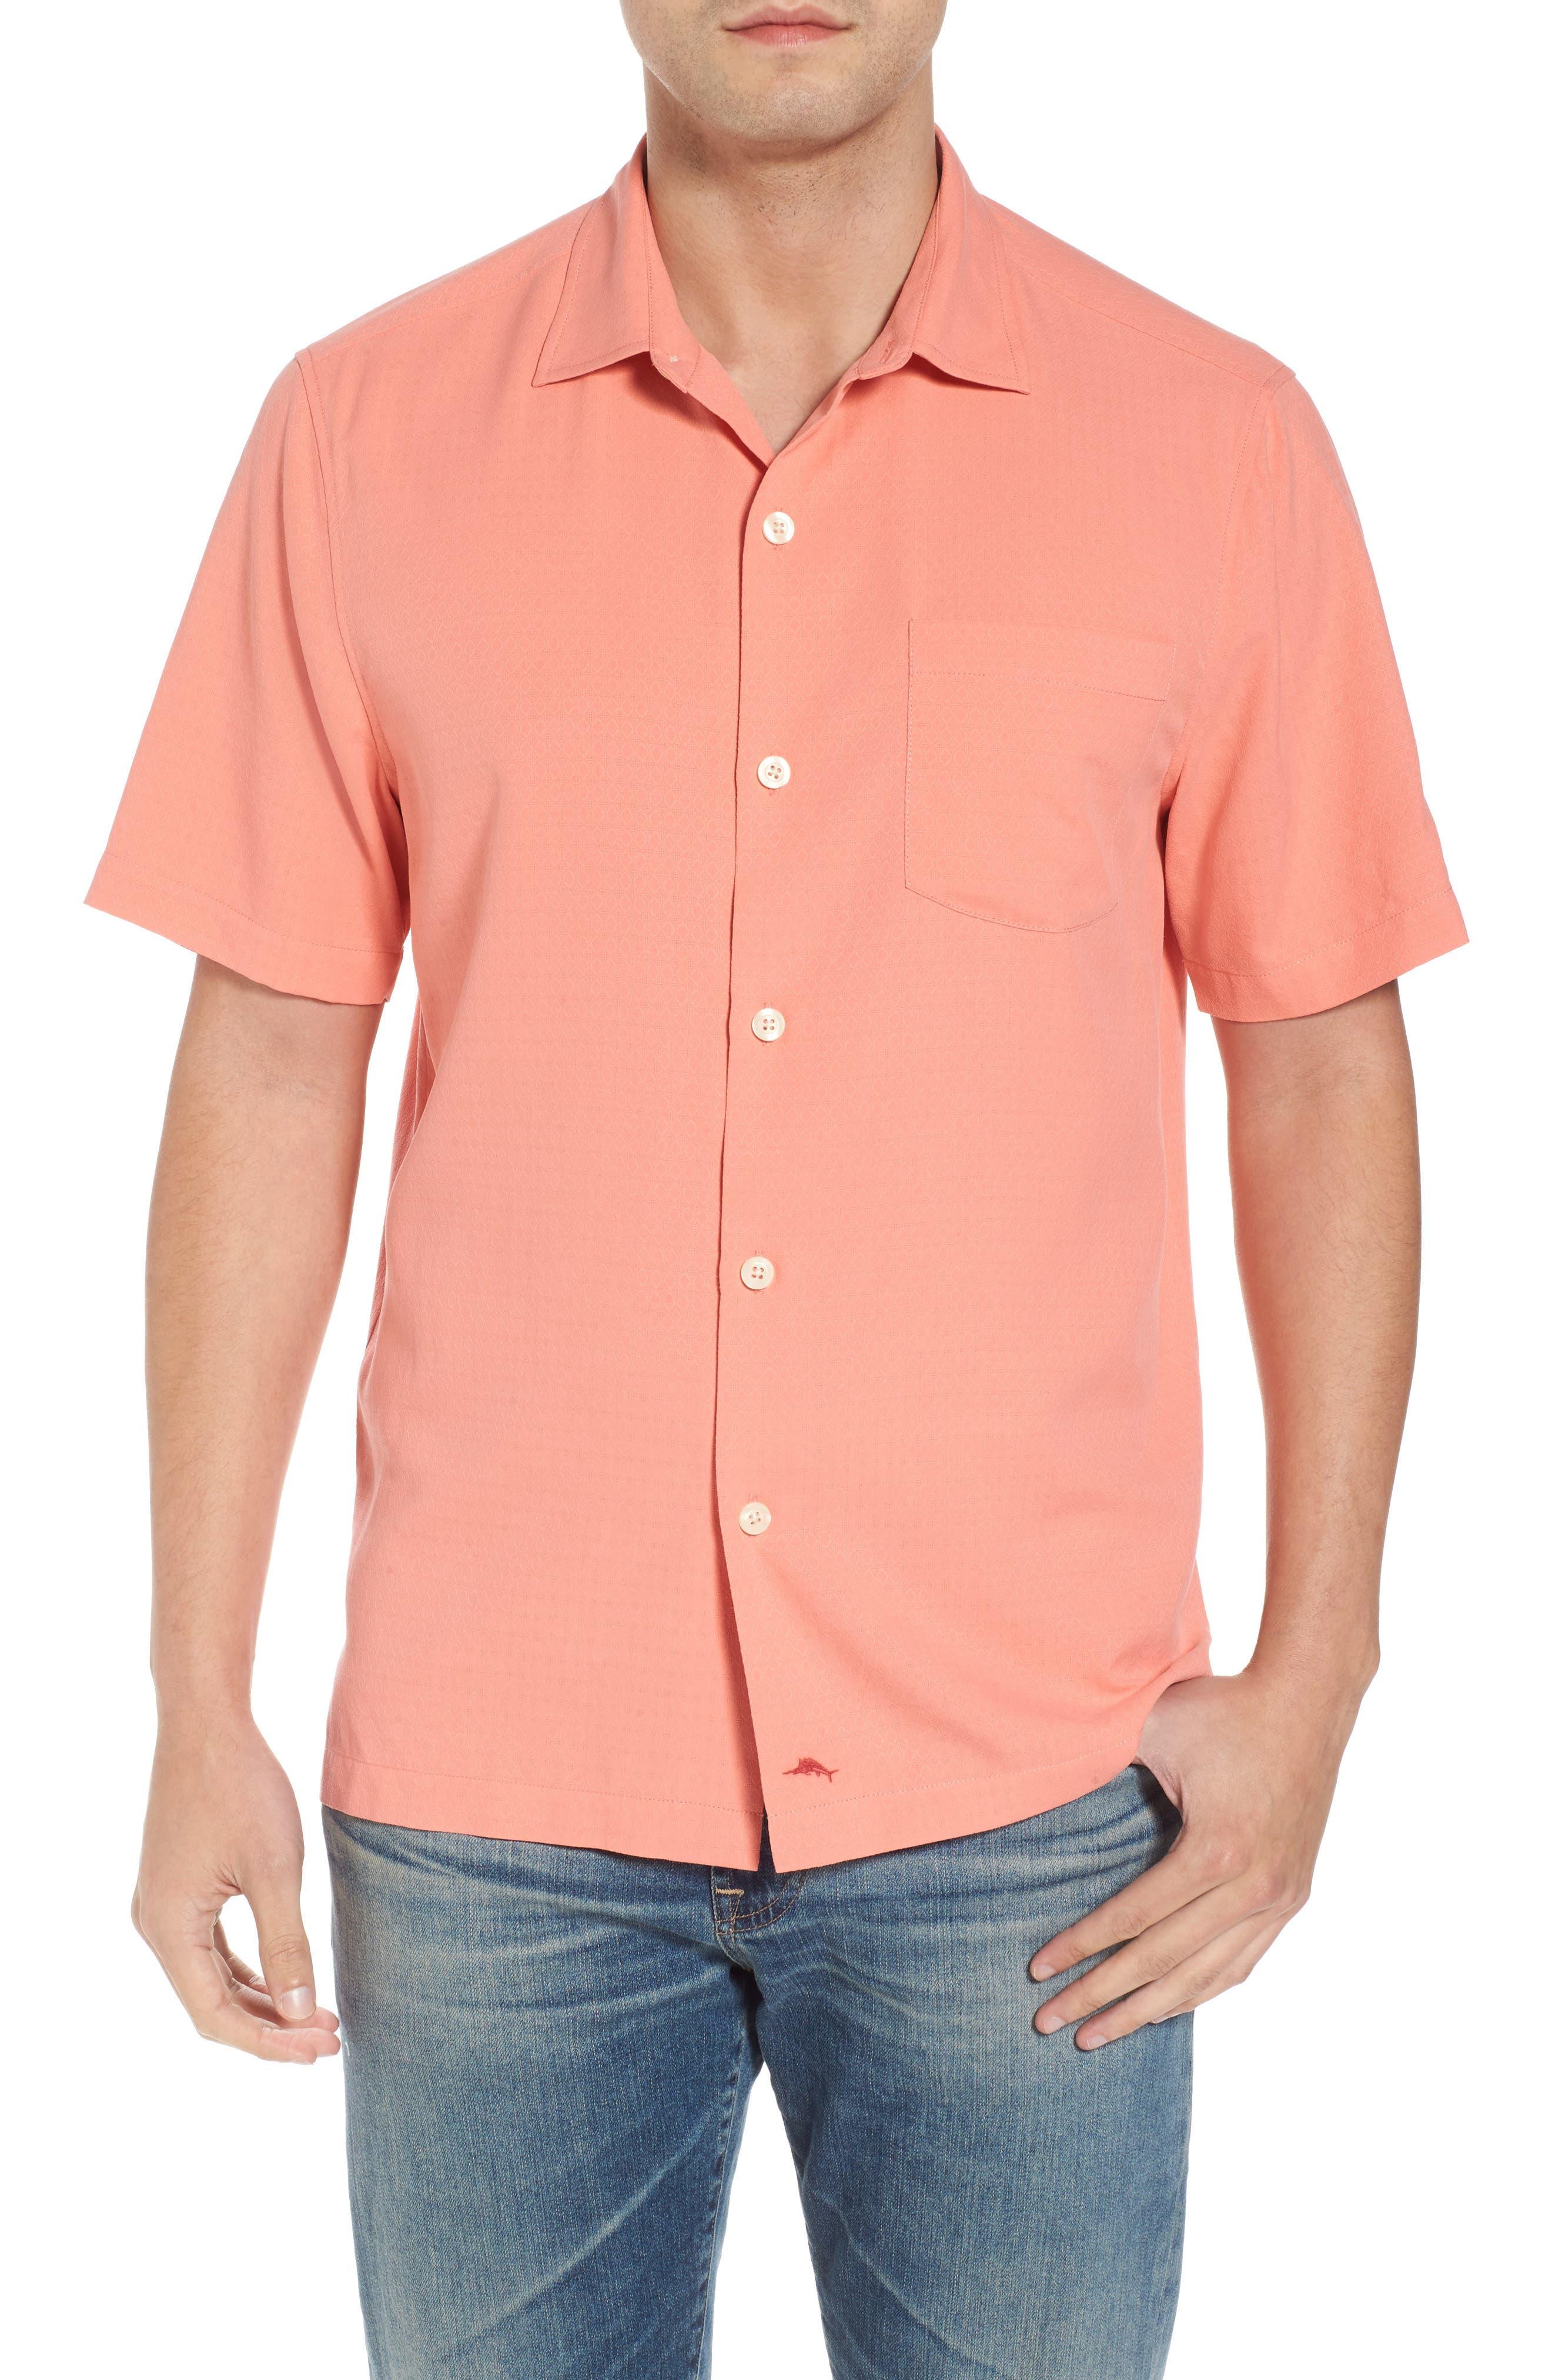 Alternate Image 1 Selected - Tommy Bahama Oasis Jacquard Silk Sport Shirt